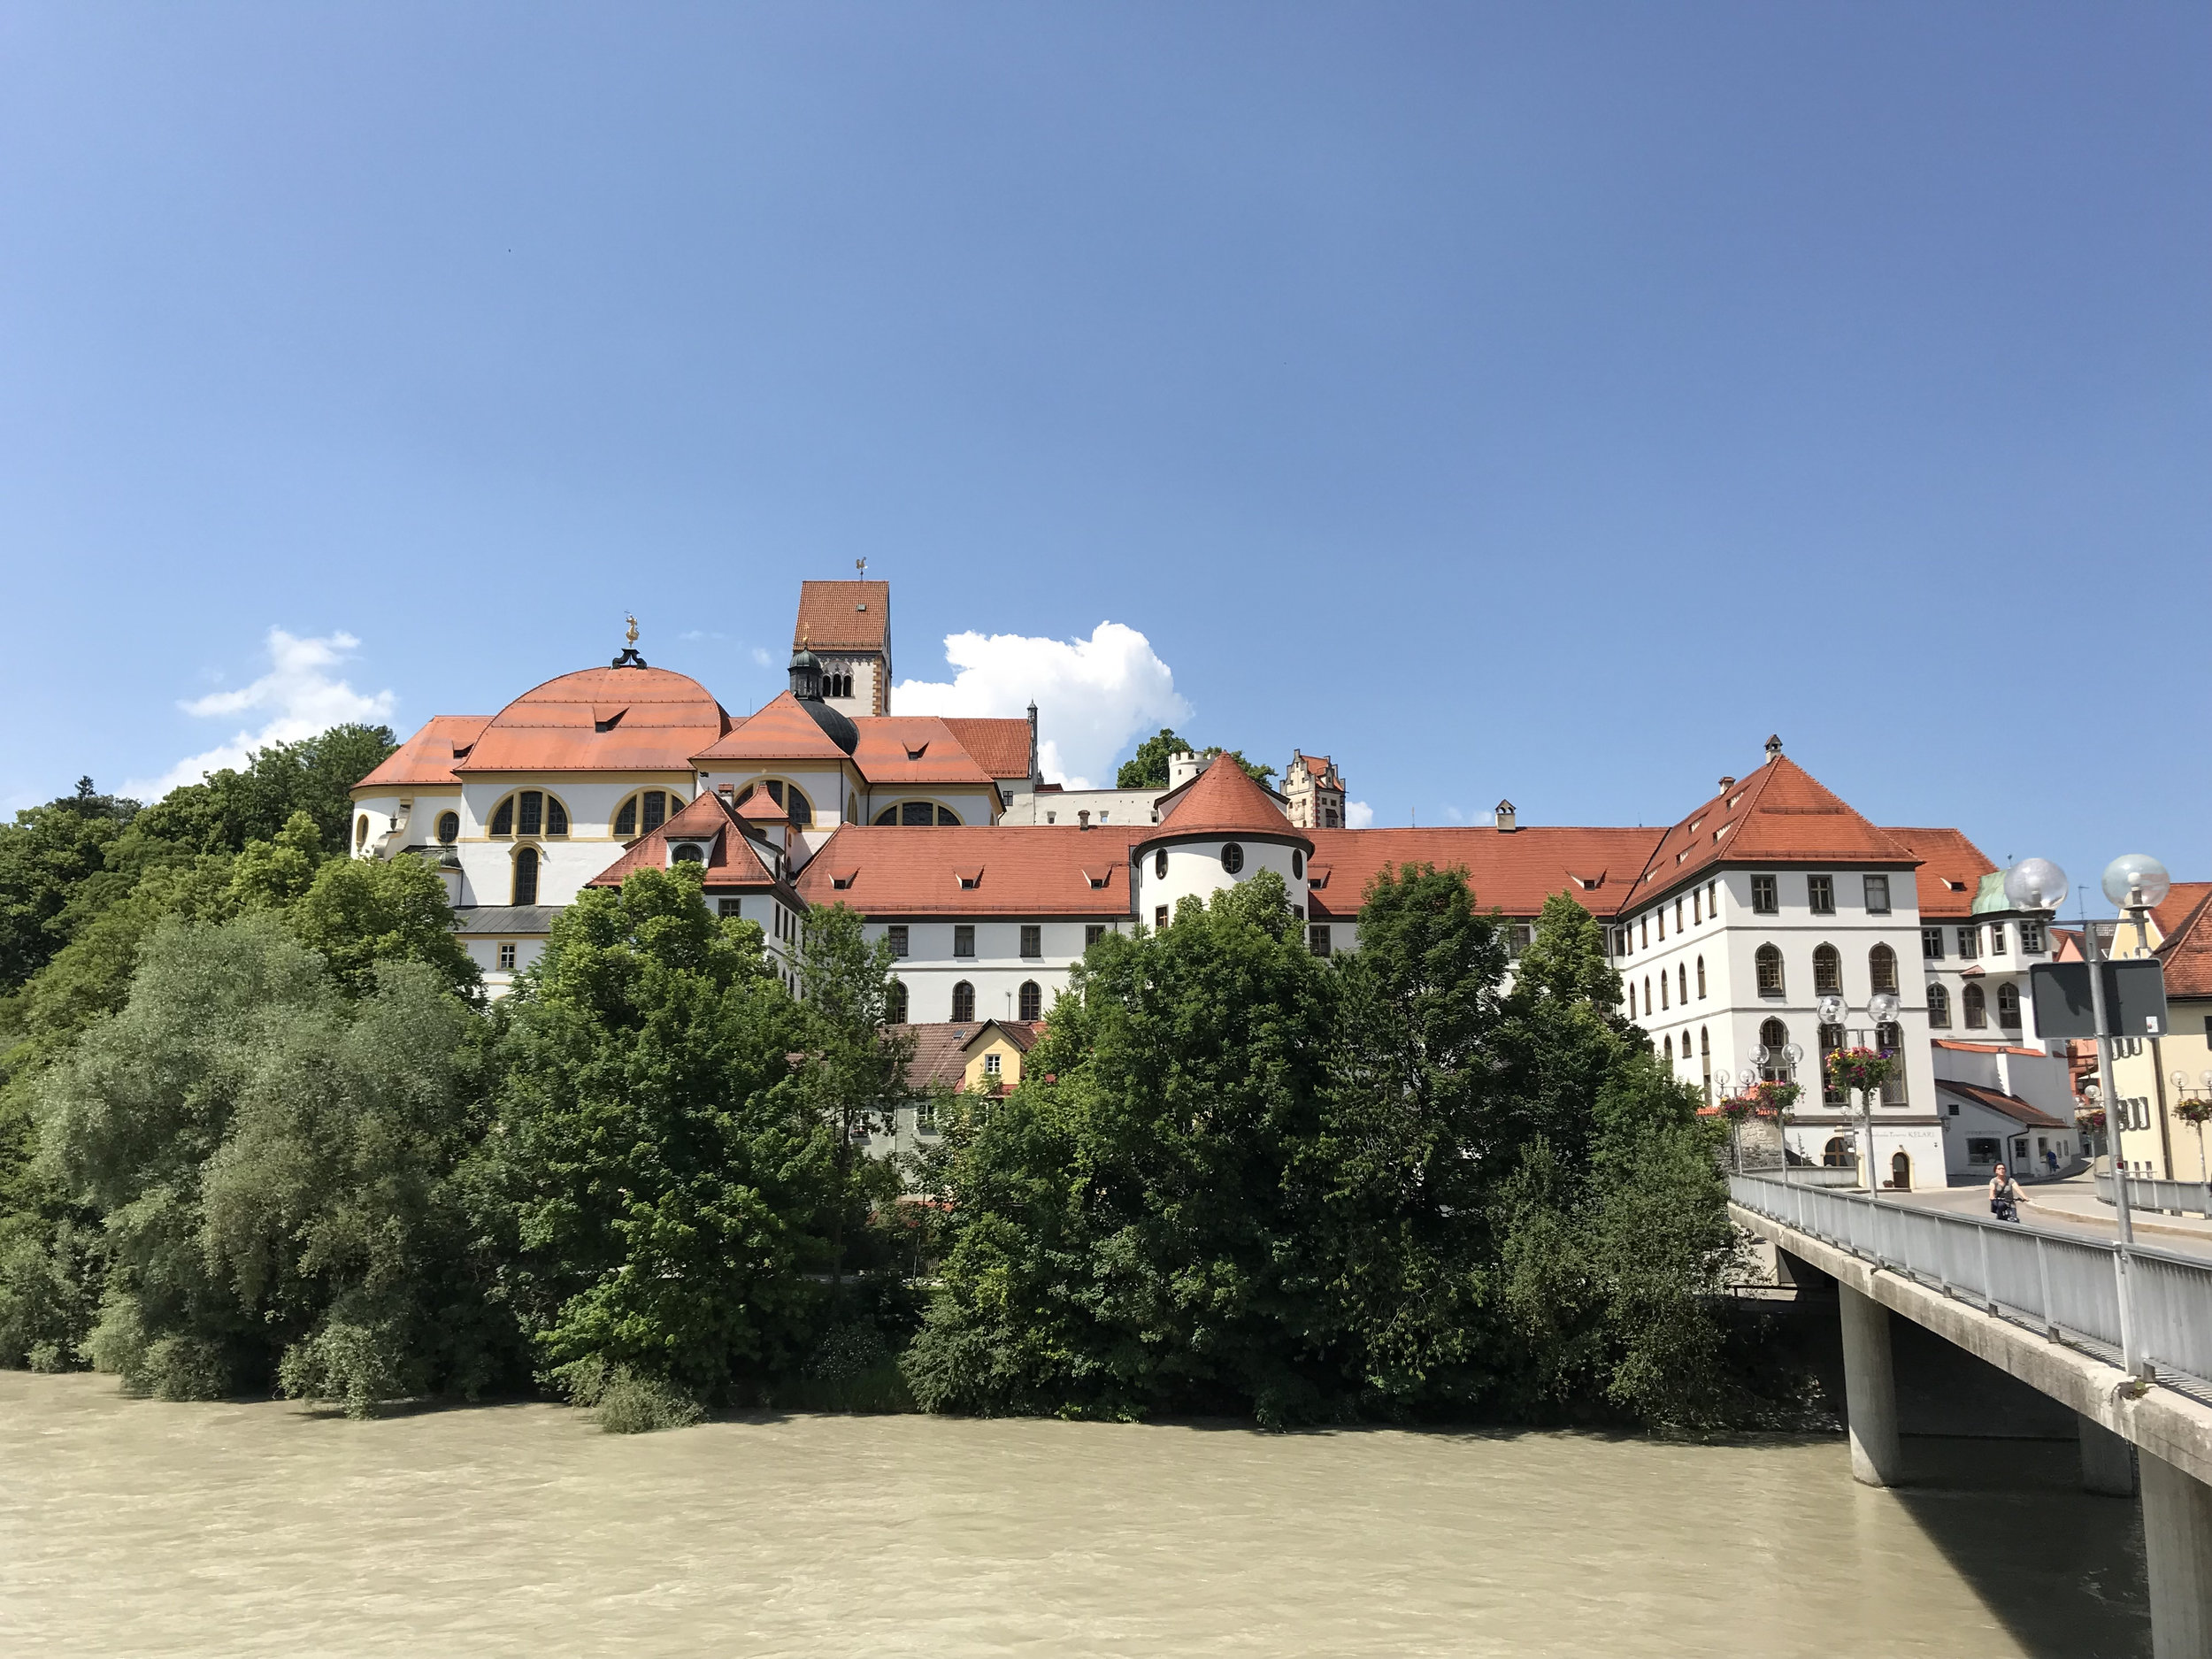 Teri_Day2_Castles_Germany&Austria_spiritedtable_photo31.jpg